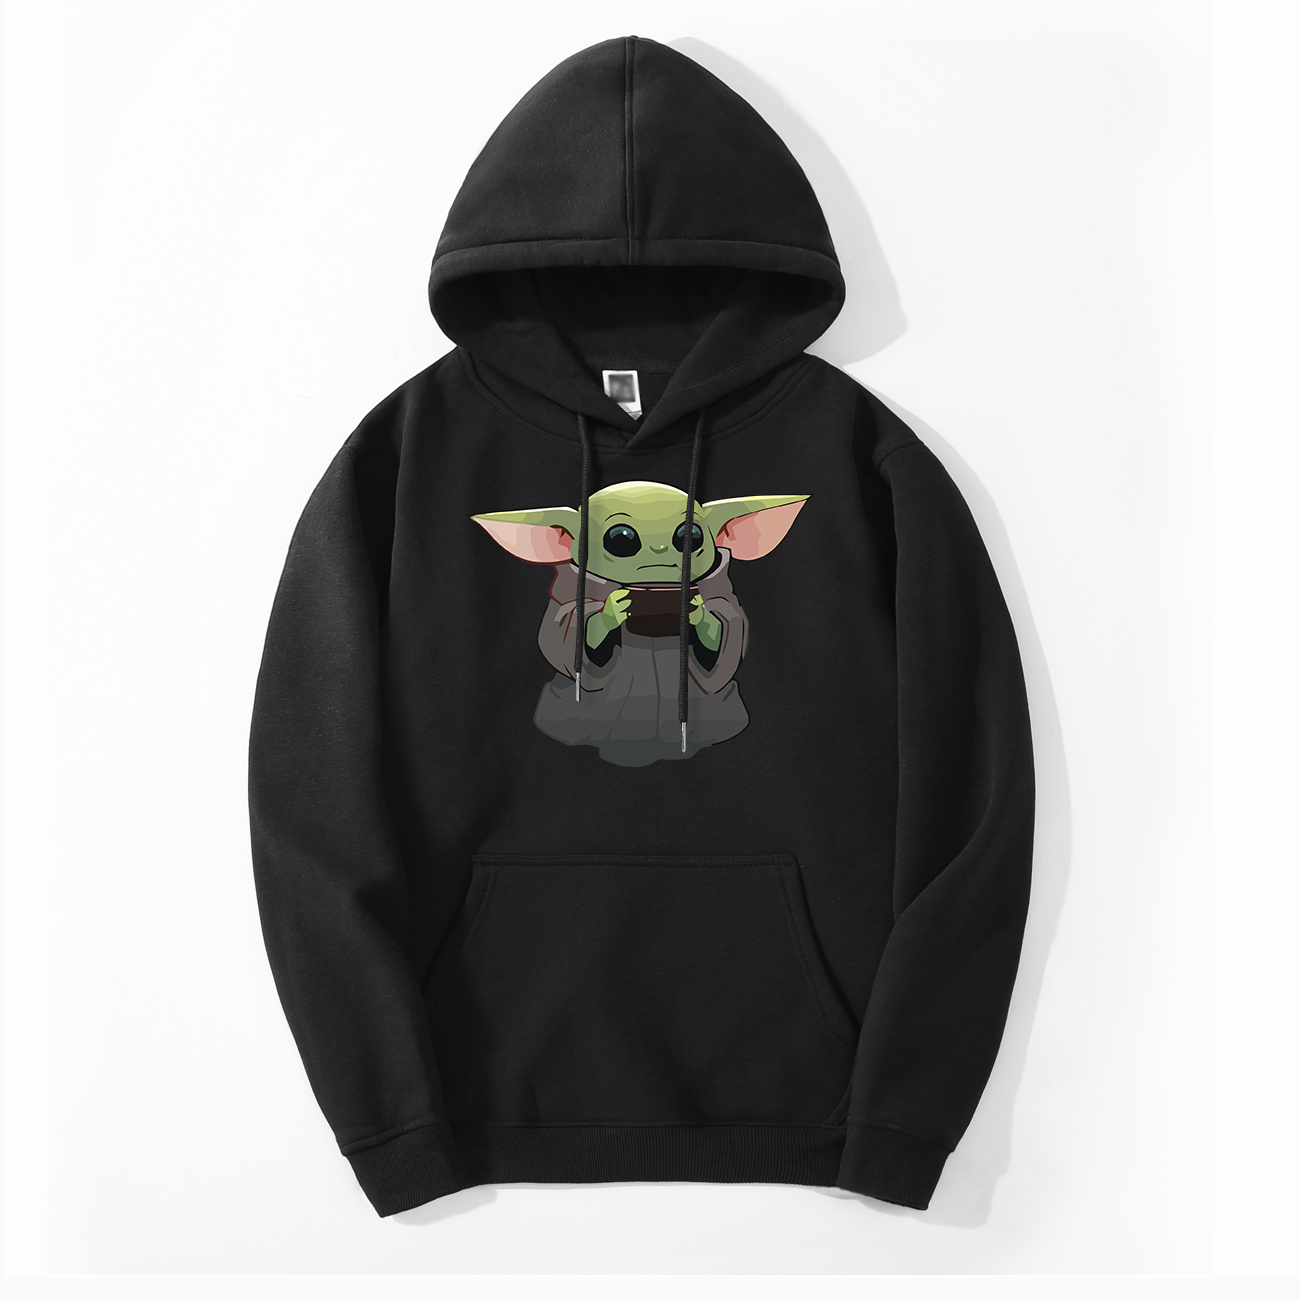 The Child Mandalorian Baby Yoda Men's Hoodies Spring Autumn Hoodies Sweatshirts Men Fleece Tops Bebe Yoda Hoodies Sweatshirt